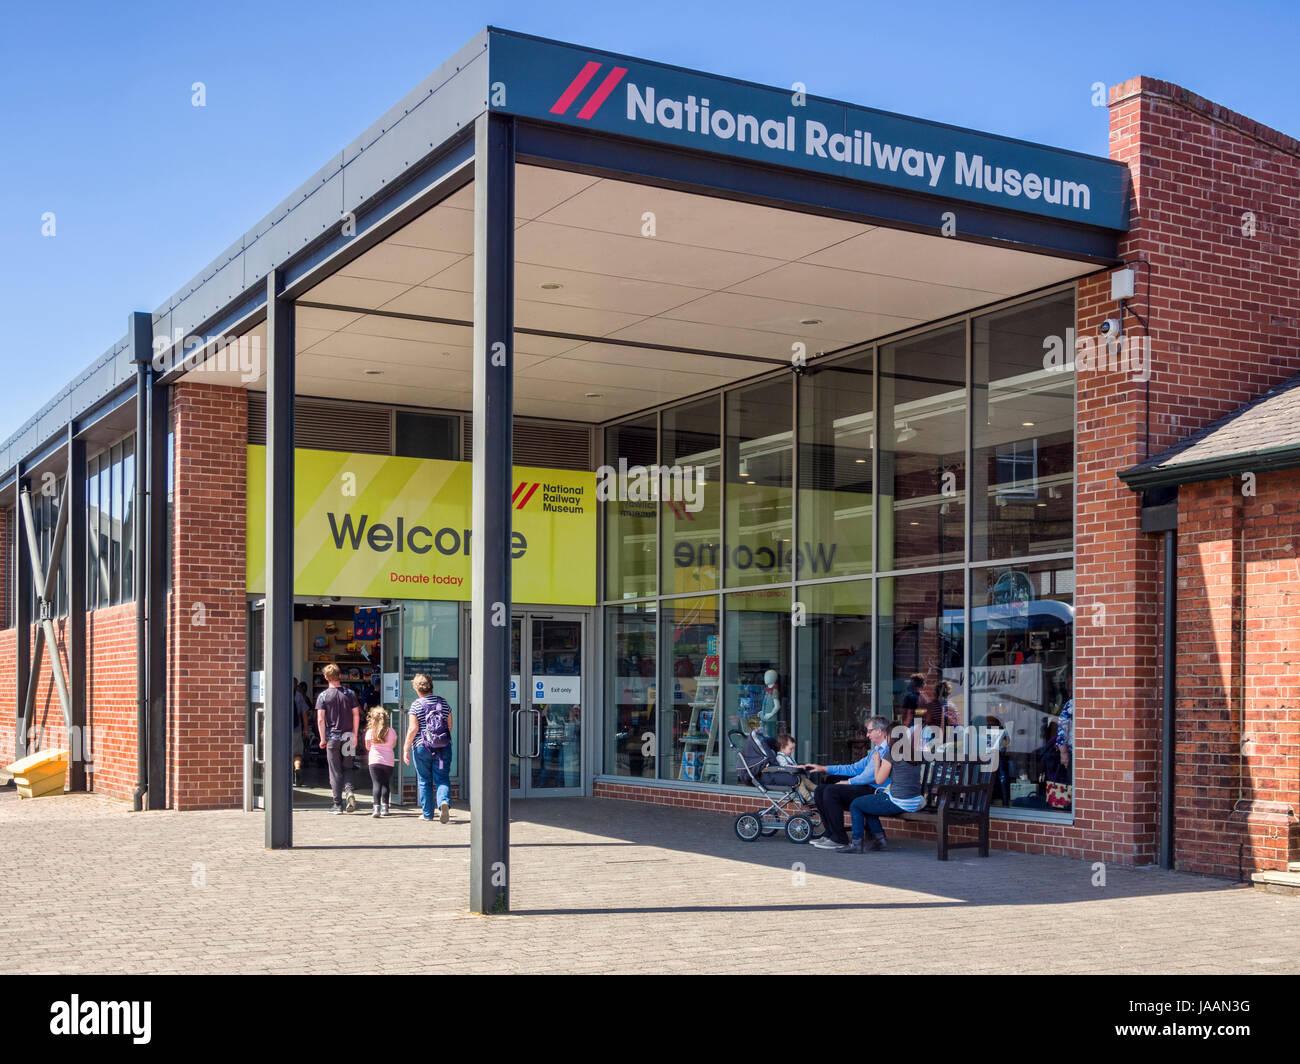 31 Mai 2017: York, North Yorkshire, Angleterre, Royaume-Uni - Les visiteurs qui entrent dans le National Railway Photo Stock